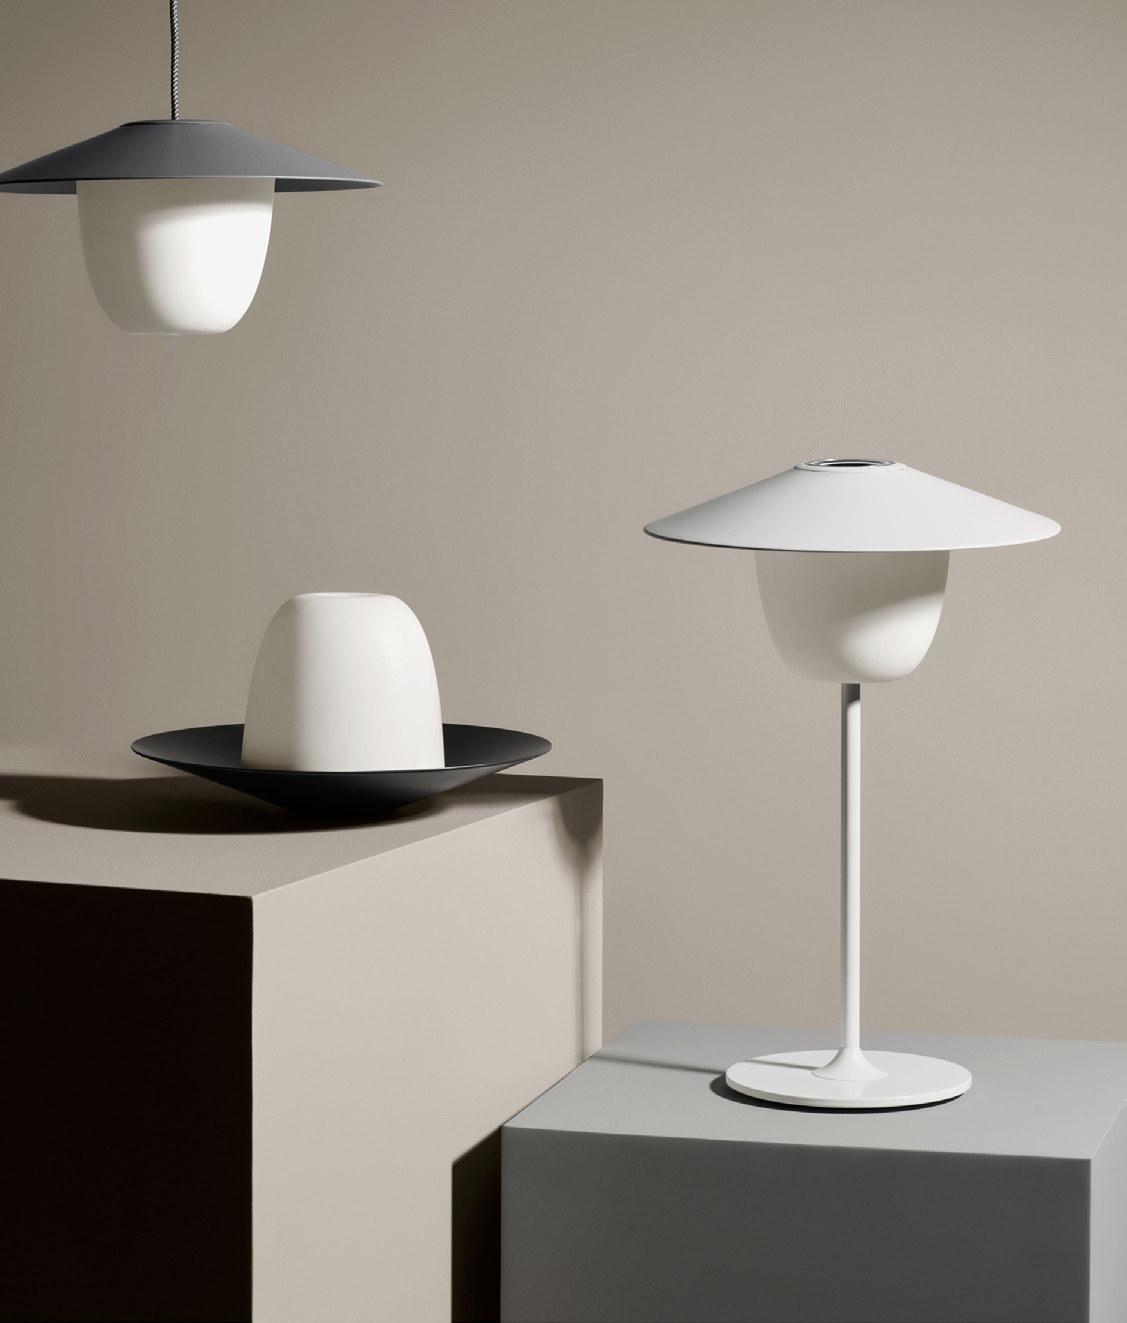 Mobile LED In-/ Outdoor Akku-Leuchte dimm-/ wandelbar 56060